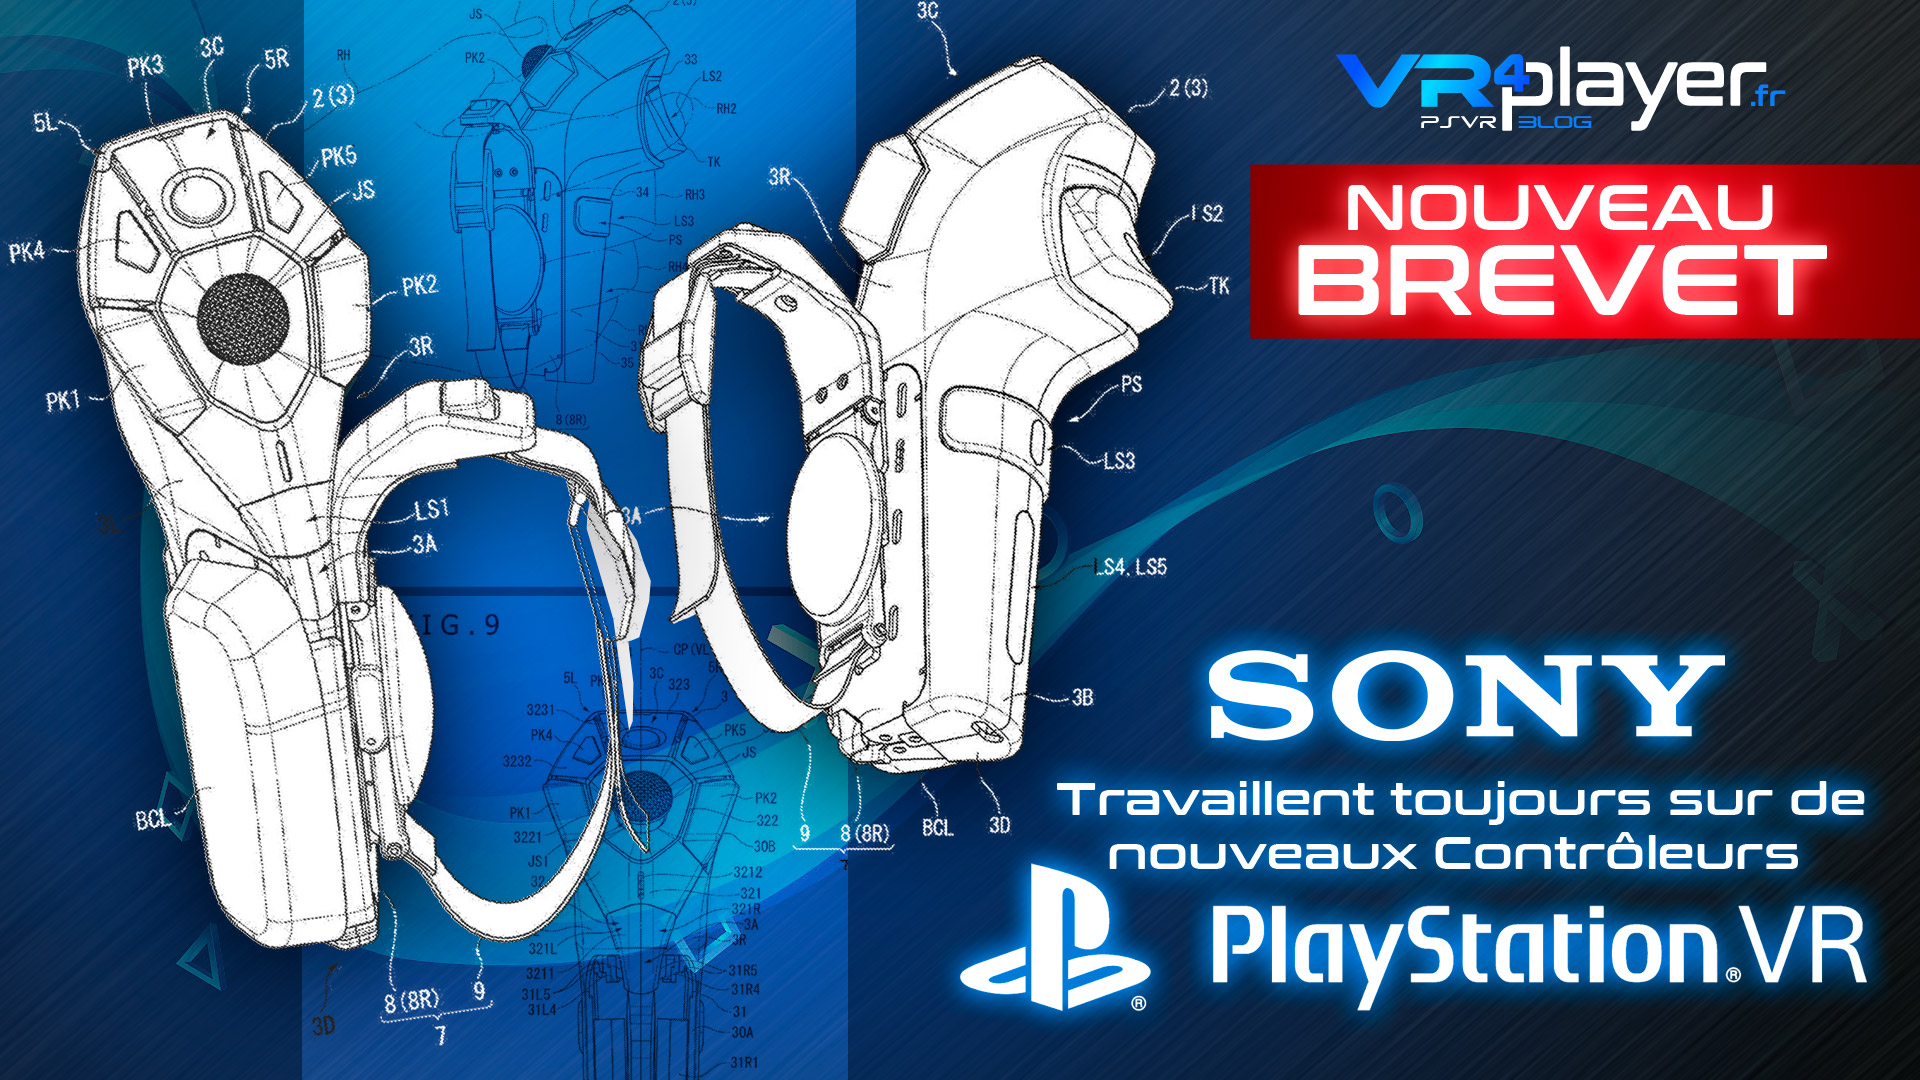 PS Move 2 PlayStation VR 2 Brevet VR4Player